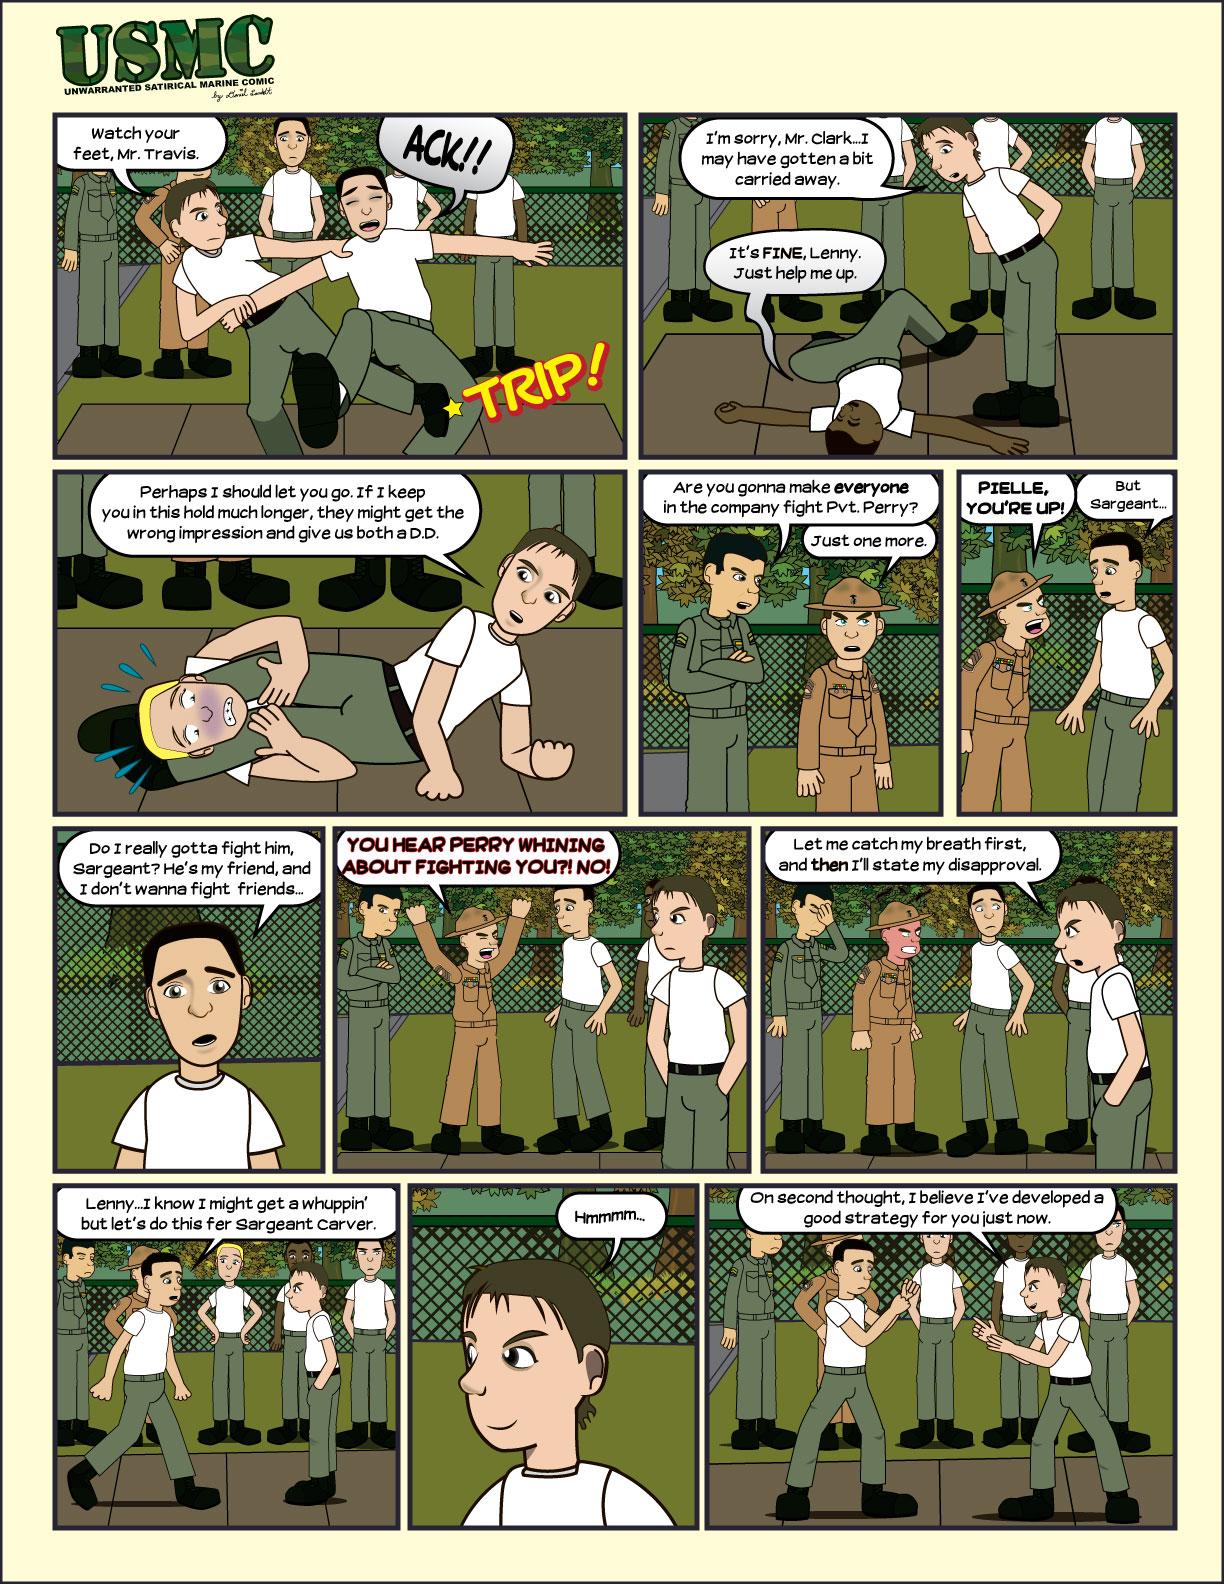 Page 6 of the comic USMC